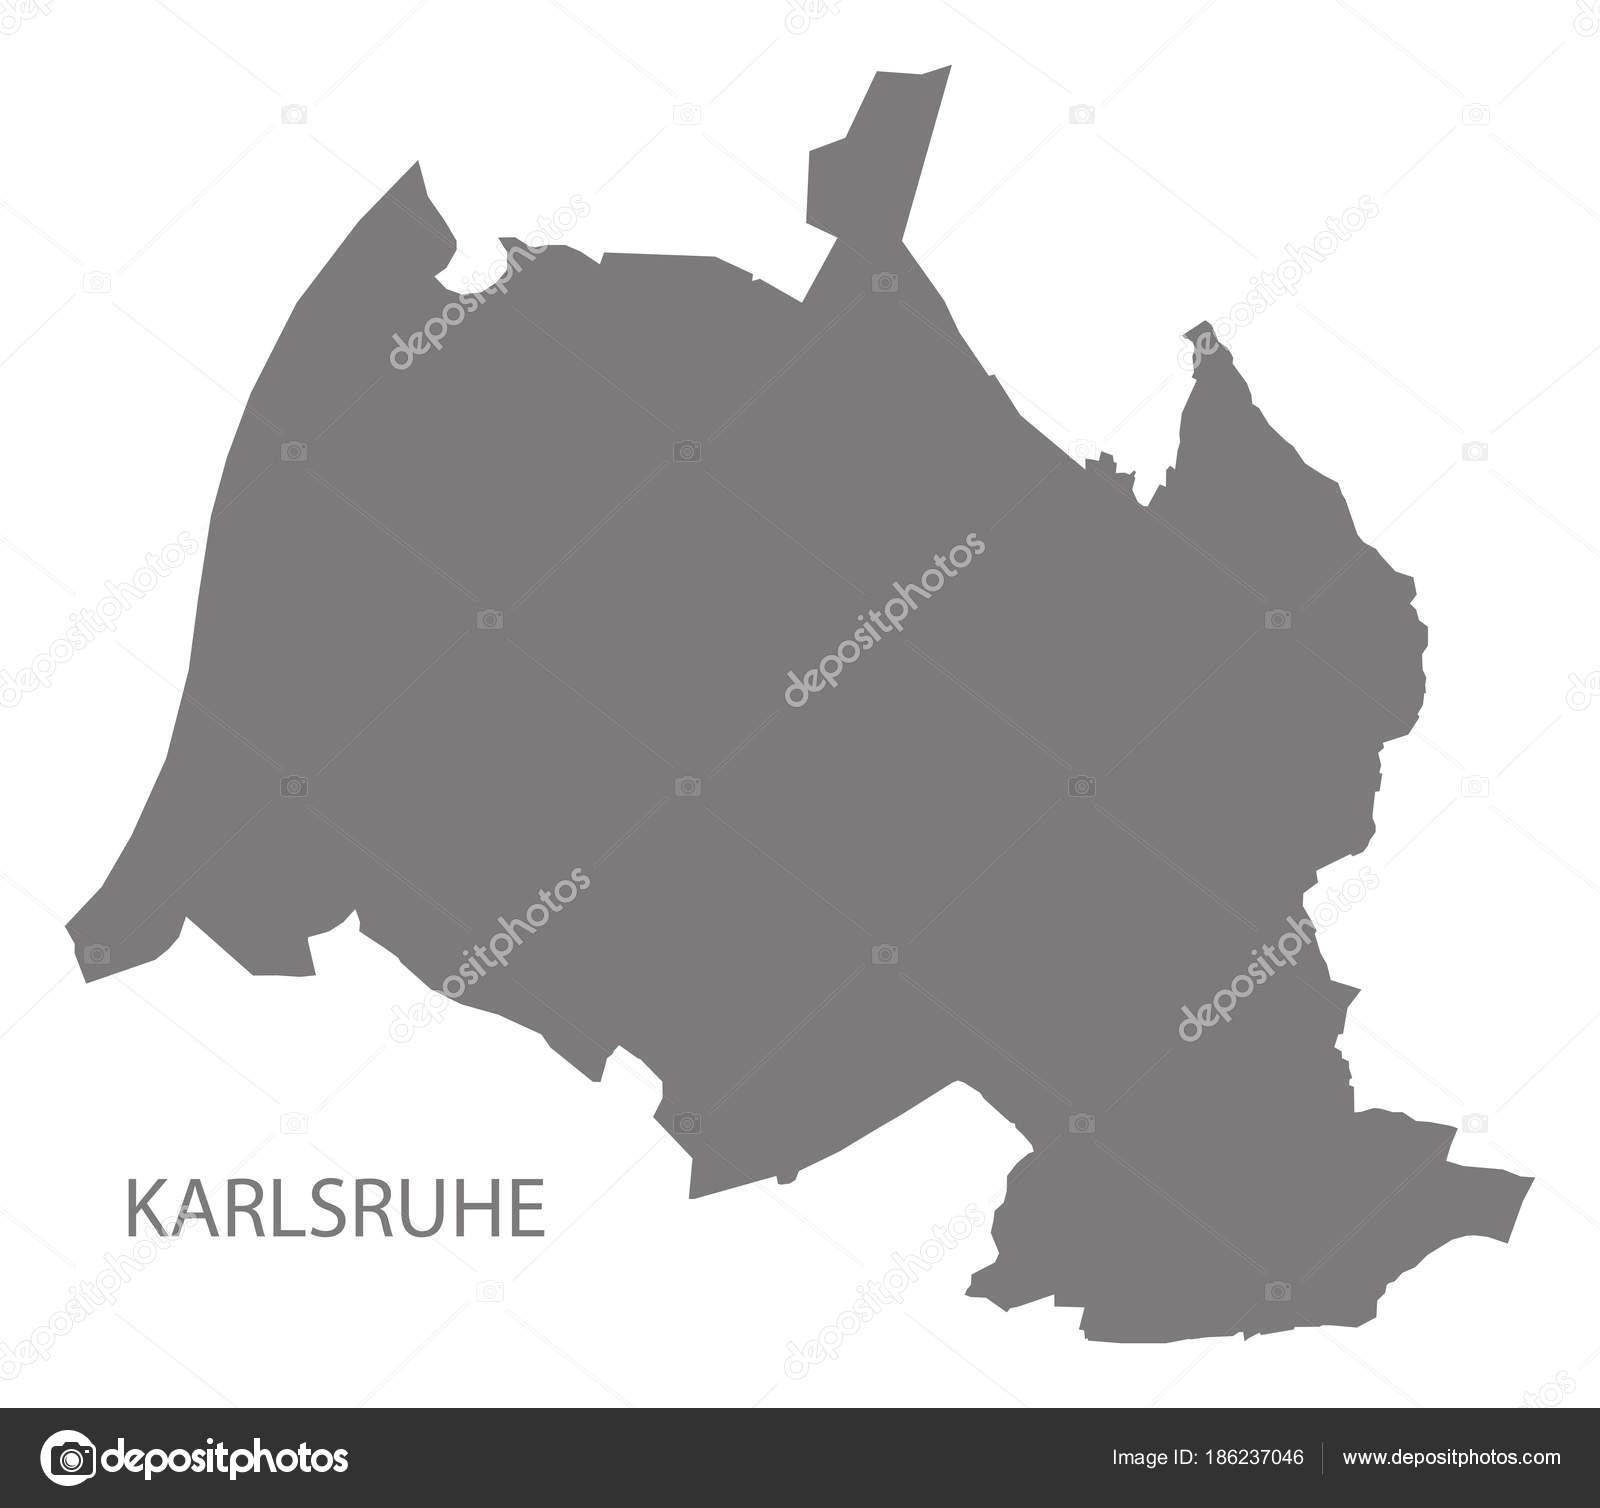 Karlsruhe Karte.Karlsruhe Stadt Karte Grau Abbildung Silhouette Form Stockvektor